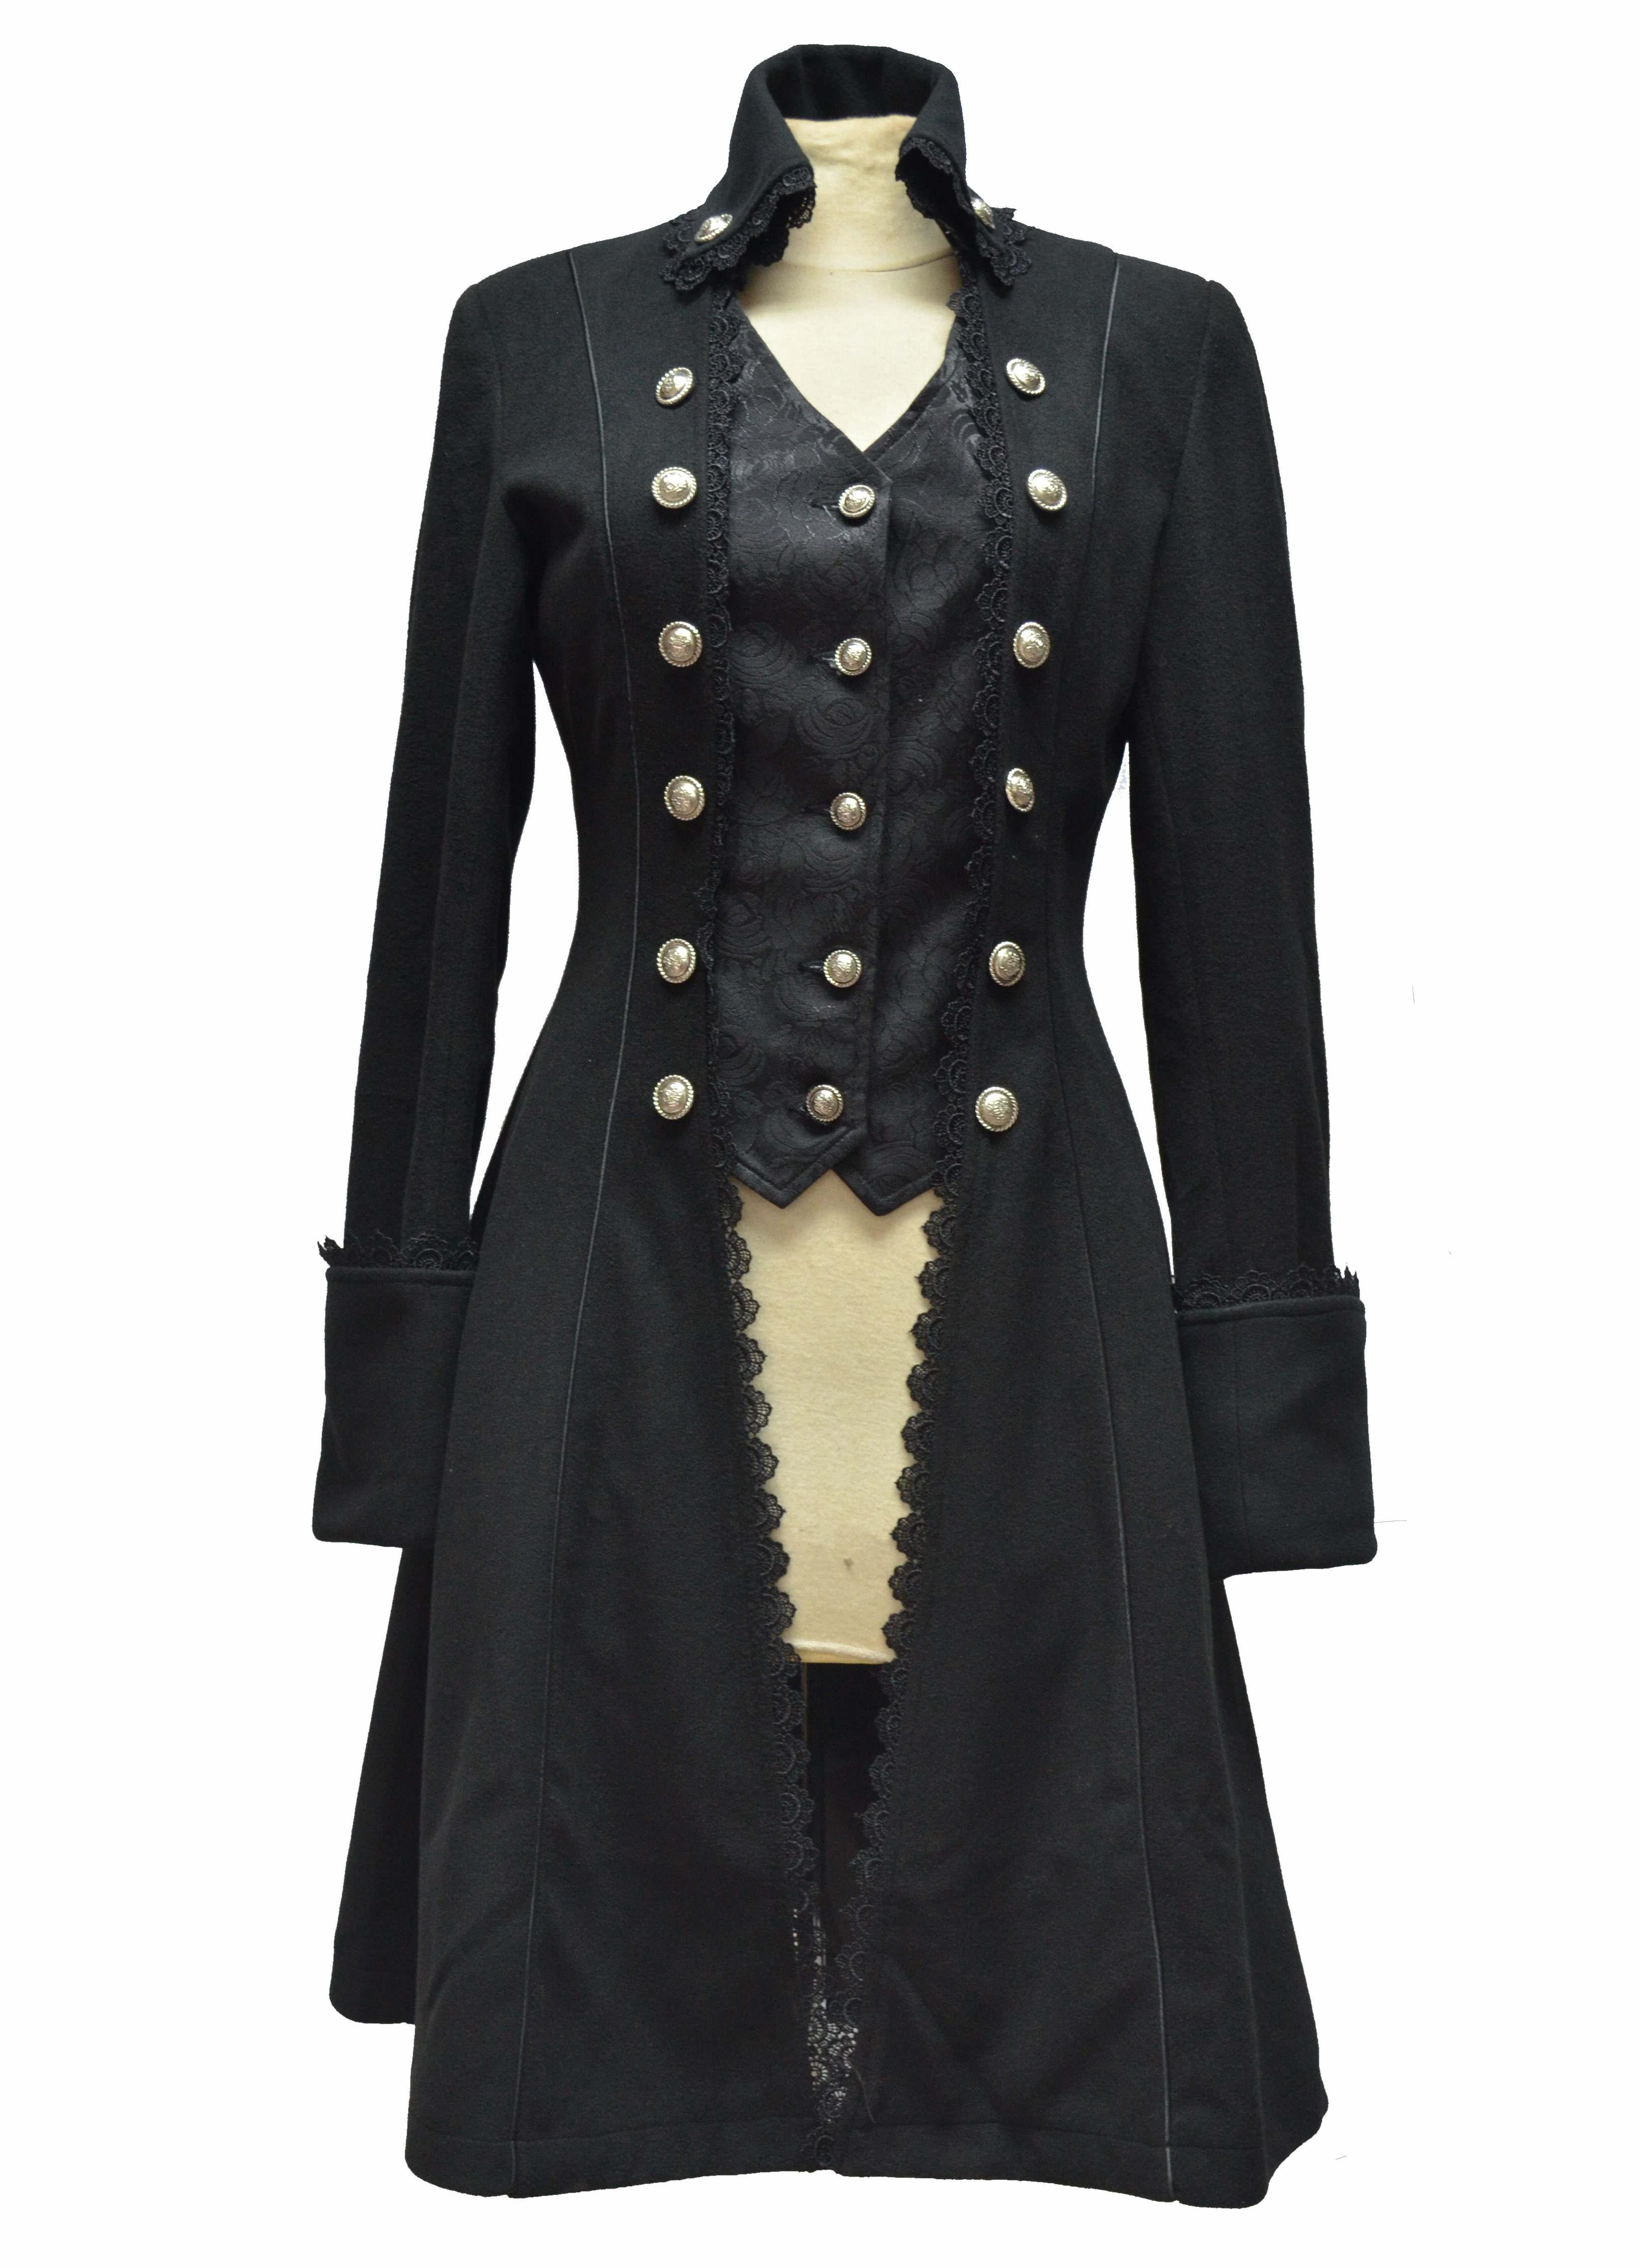 black_gothic_long_coat_for_women_coats_4.jpg